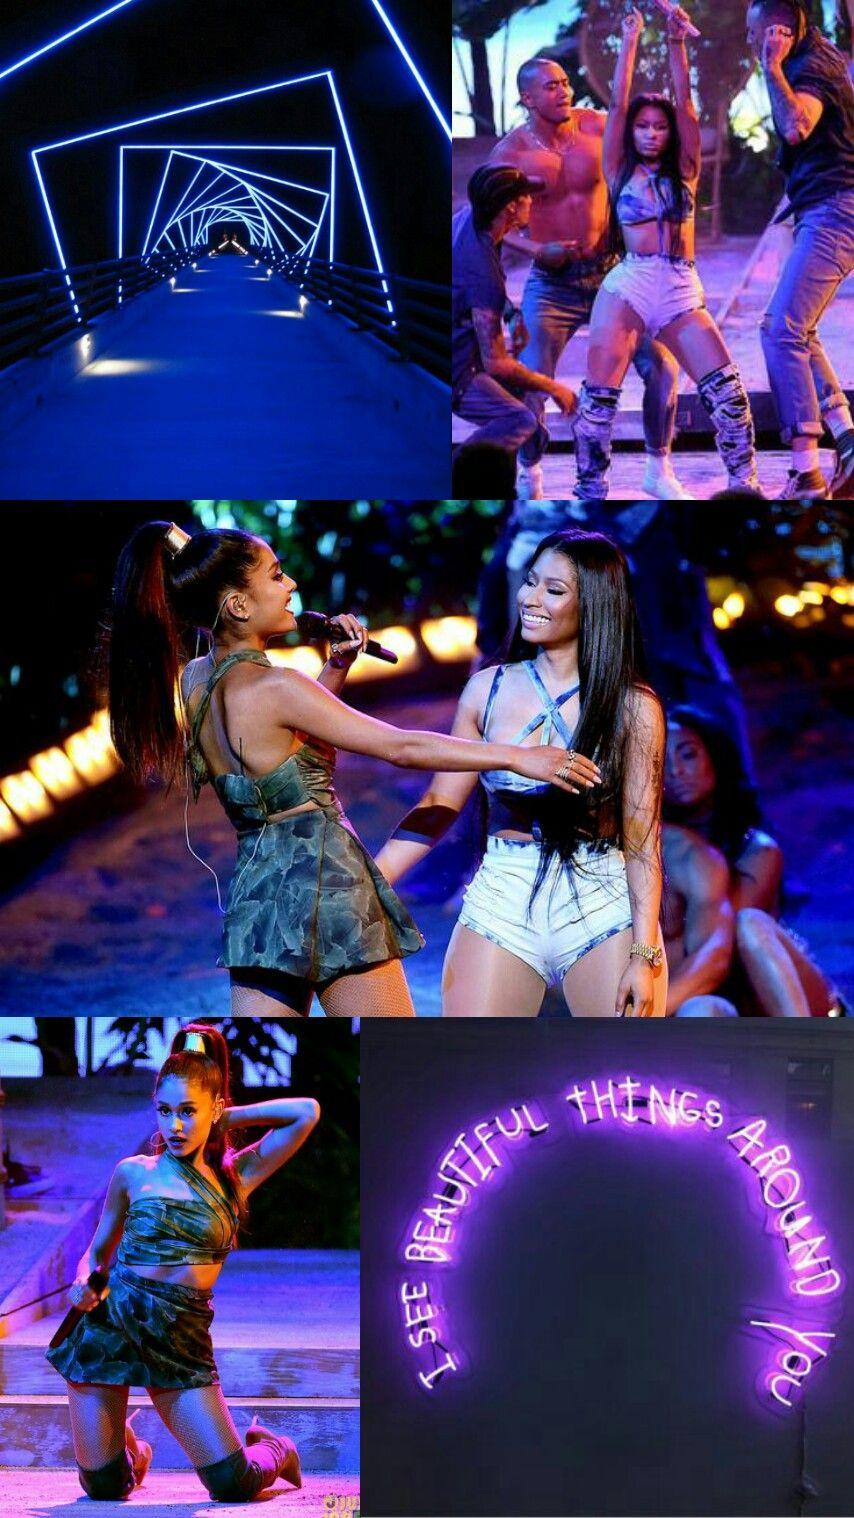 Ariana Grande and Nicki Minaj LockscreenWallpaper Ariana grande 854x1518